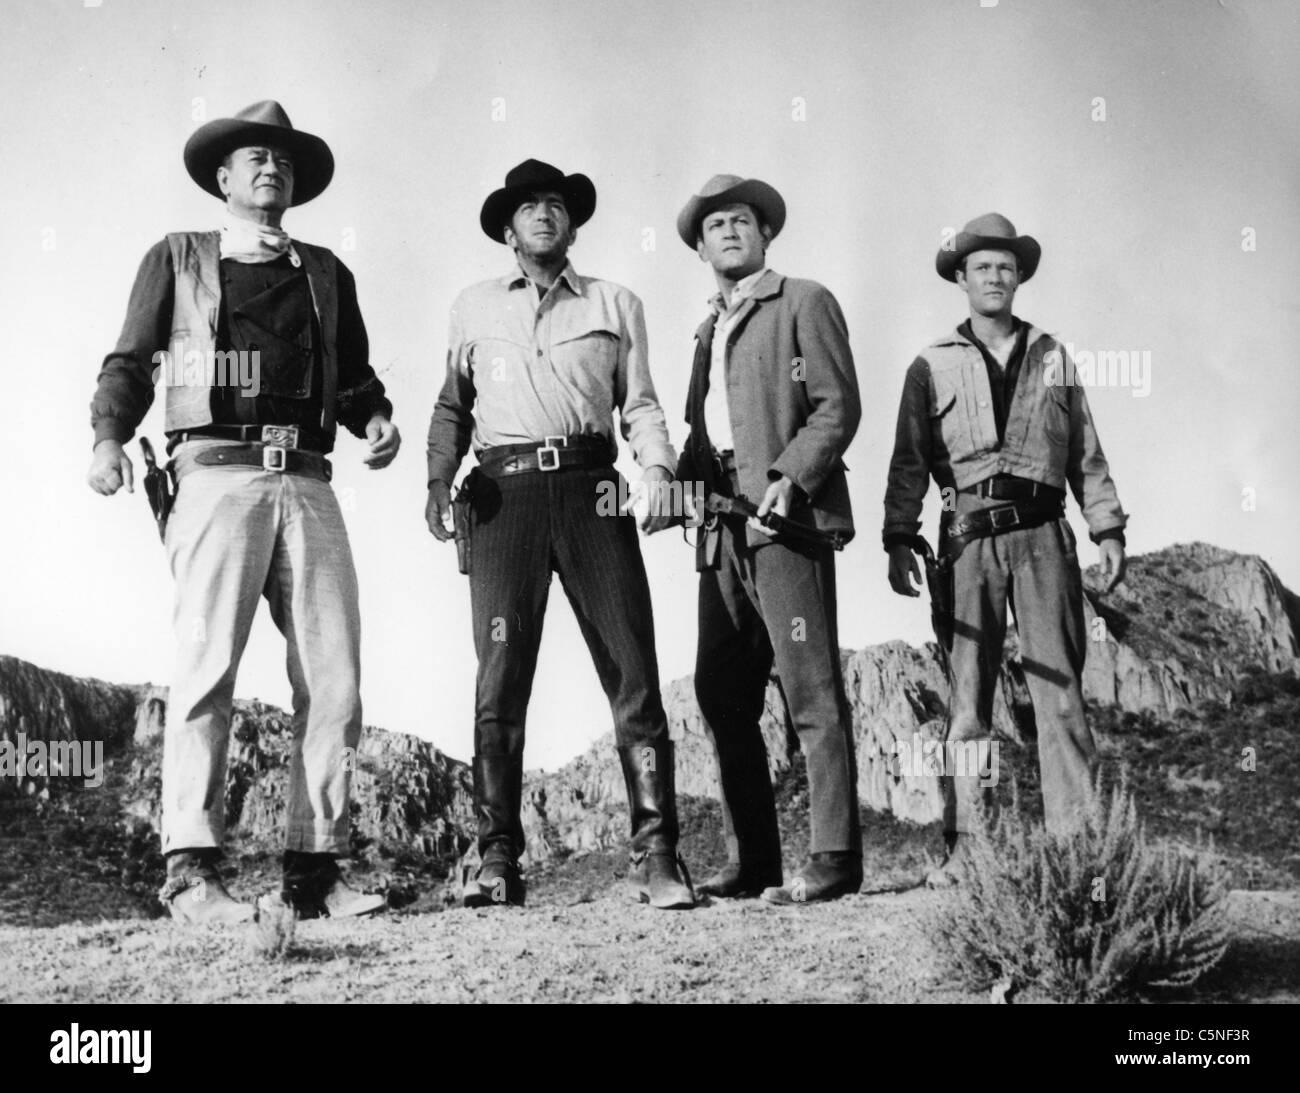 john wayne, dean martin, earl holliman, michael anderson, the sons of katie elder 1965 - Stock Image